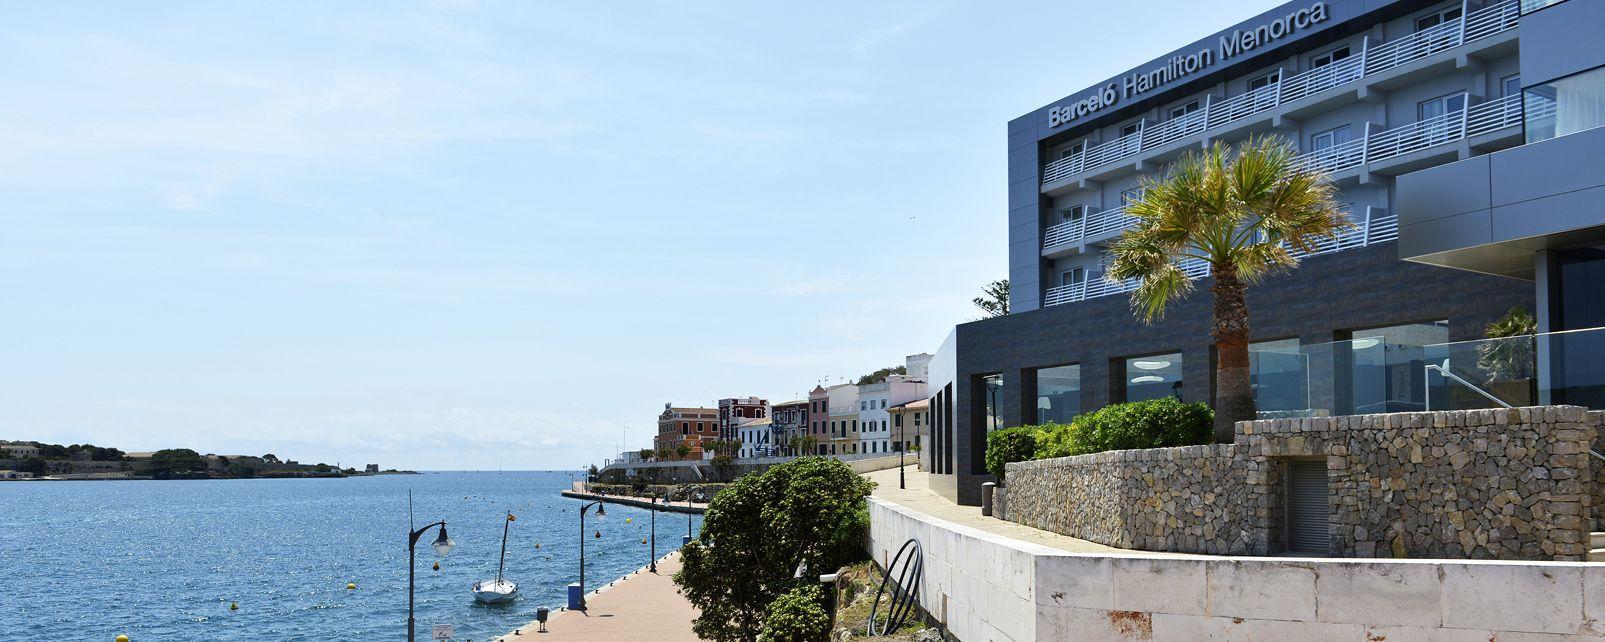 Hôtel Barcelo Hamilton Menorca